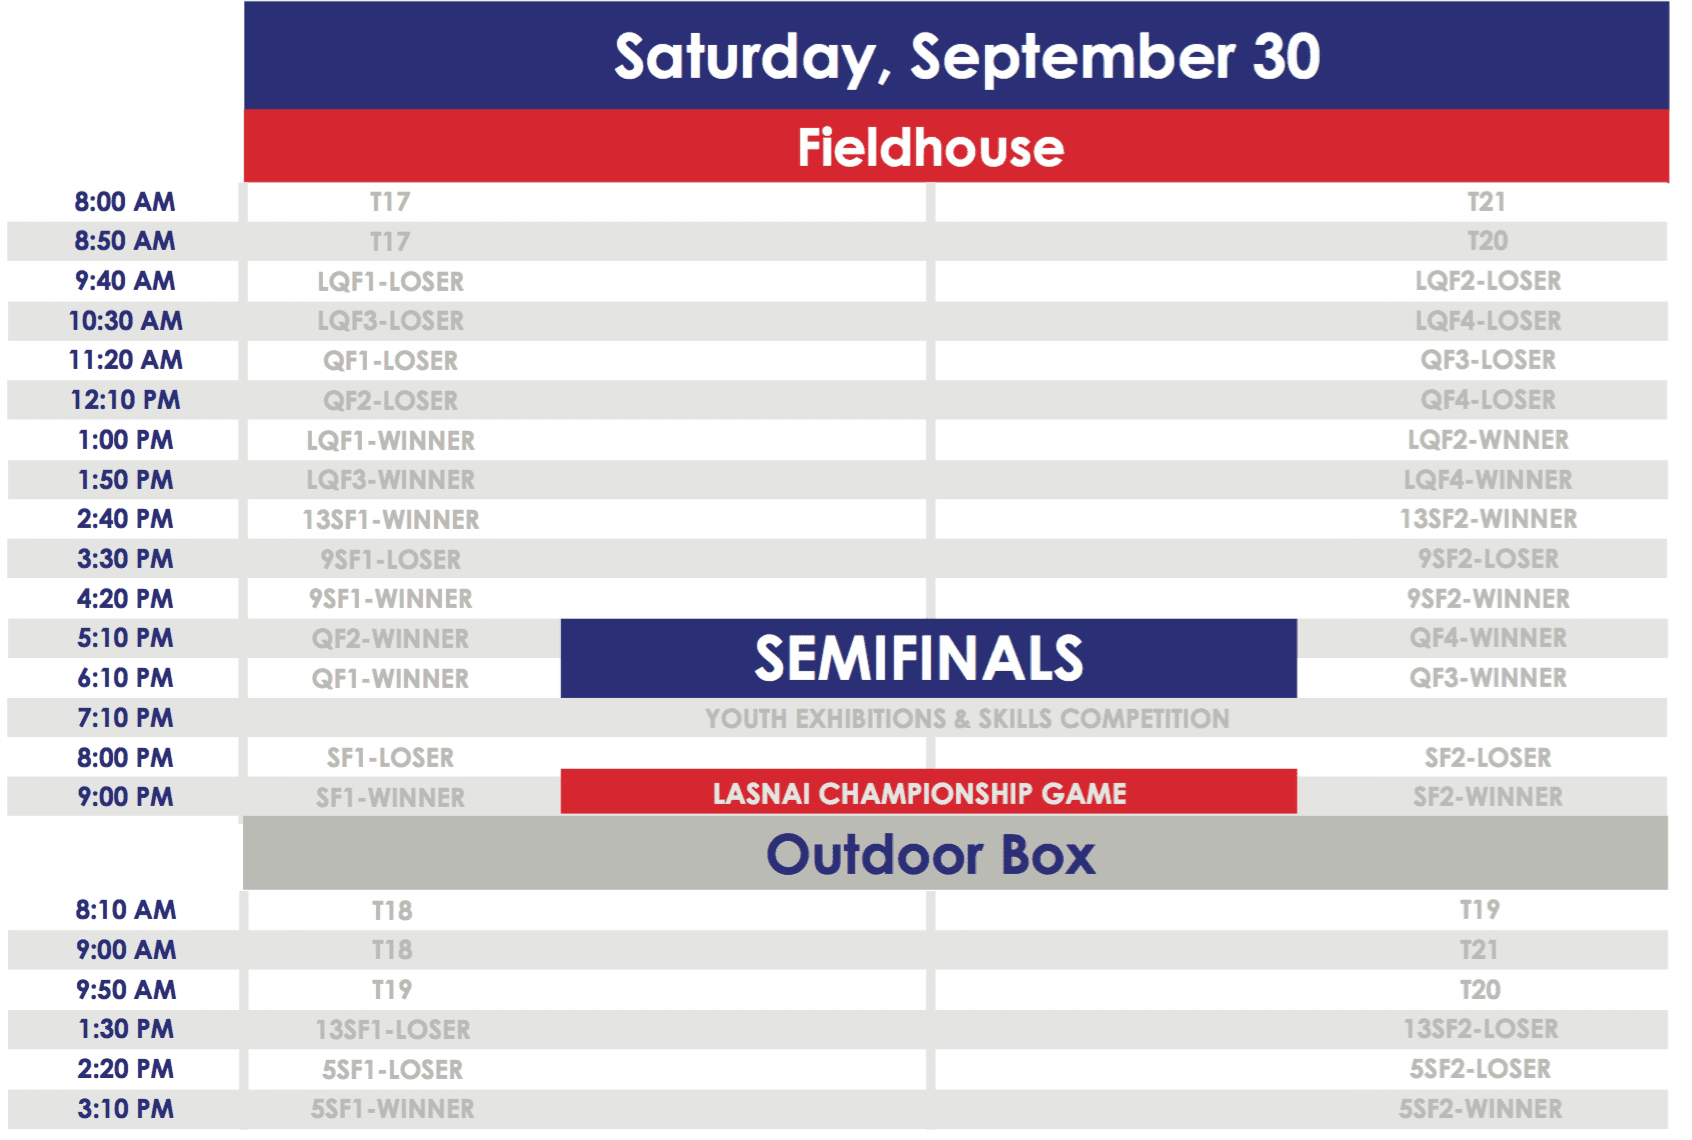 2017 LASNAI Schedule - Saturday, September 30